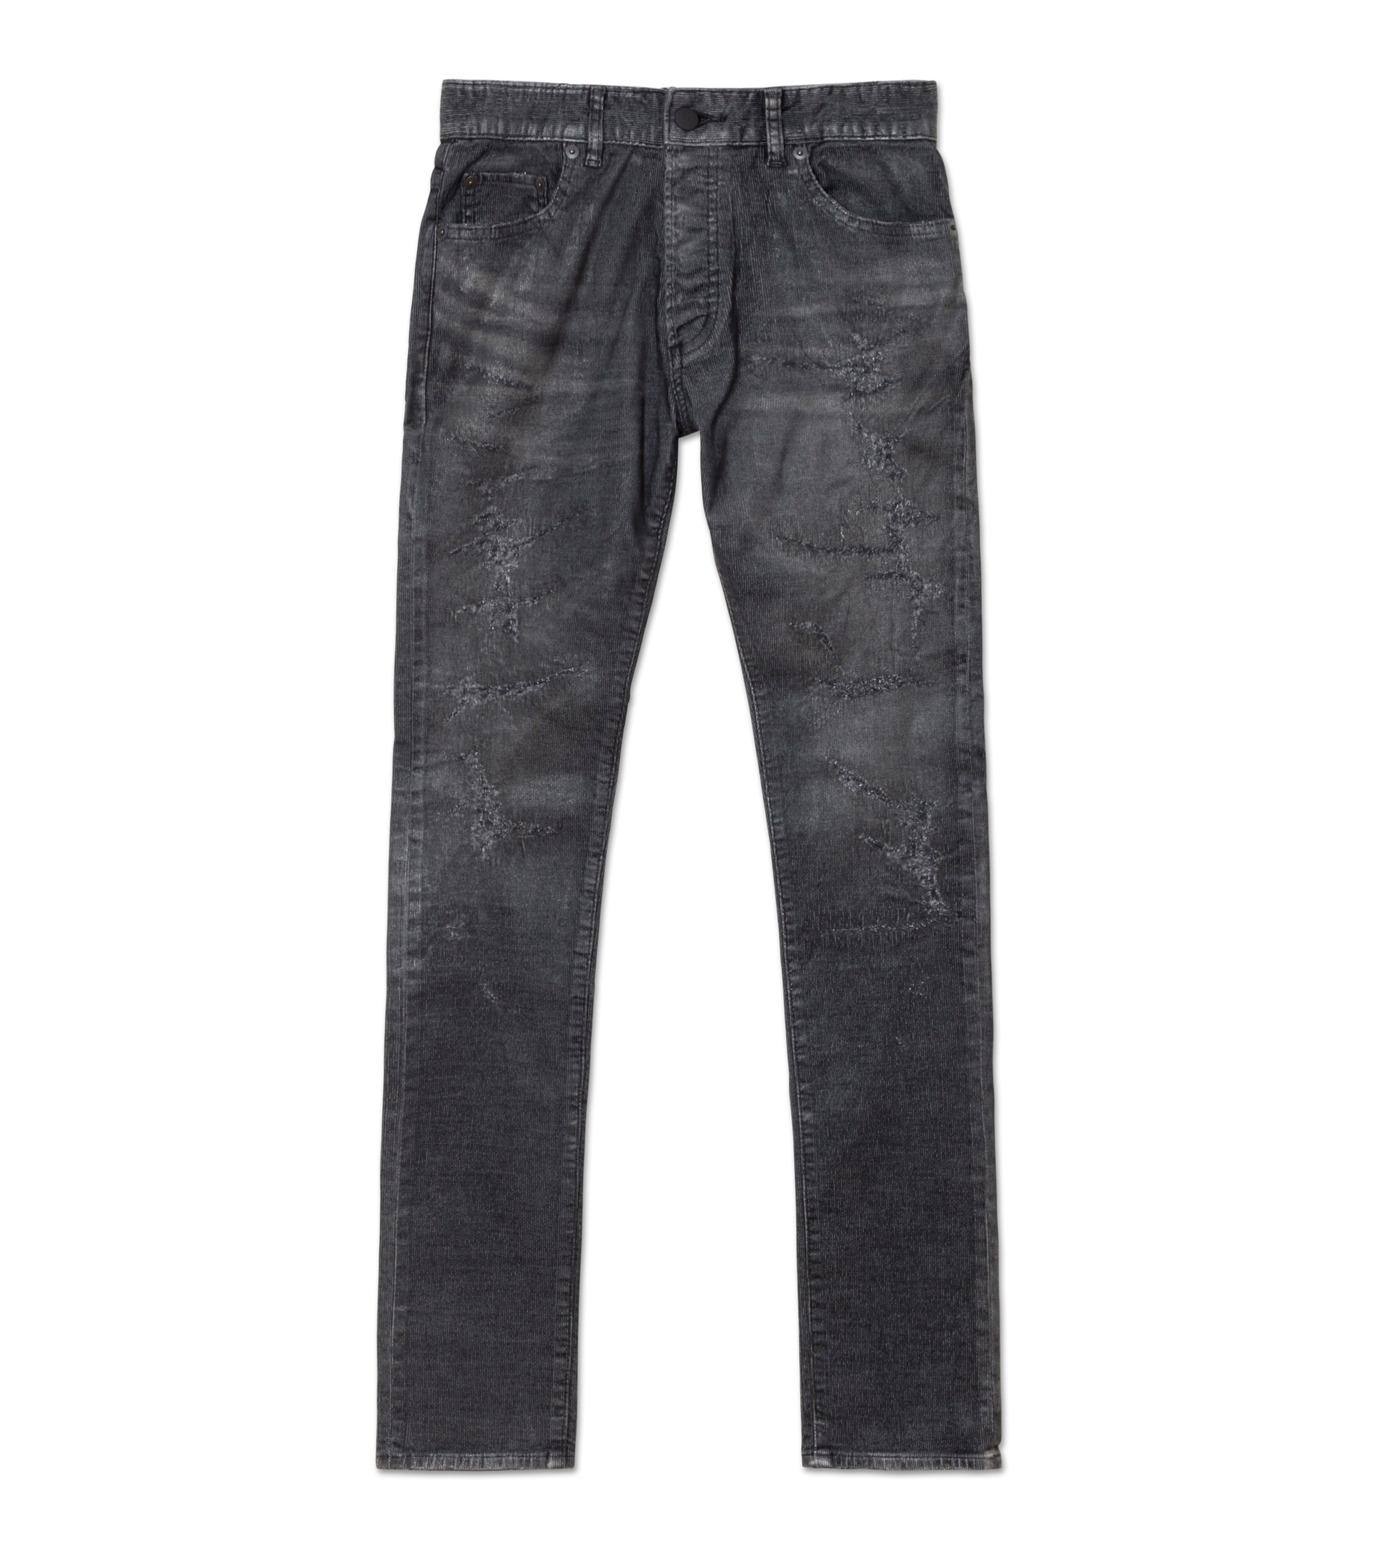 HL HEDDIE LOVU(エイチエル・エディールーヴ)のCOATING CORDUROY PANTS-GRAY(パンツ/pants)-18A98002-11 拡大詳細画像1